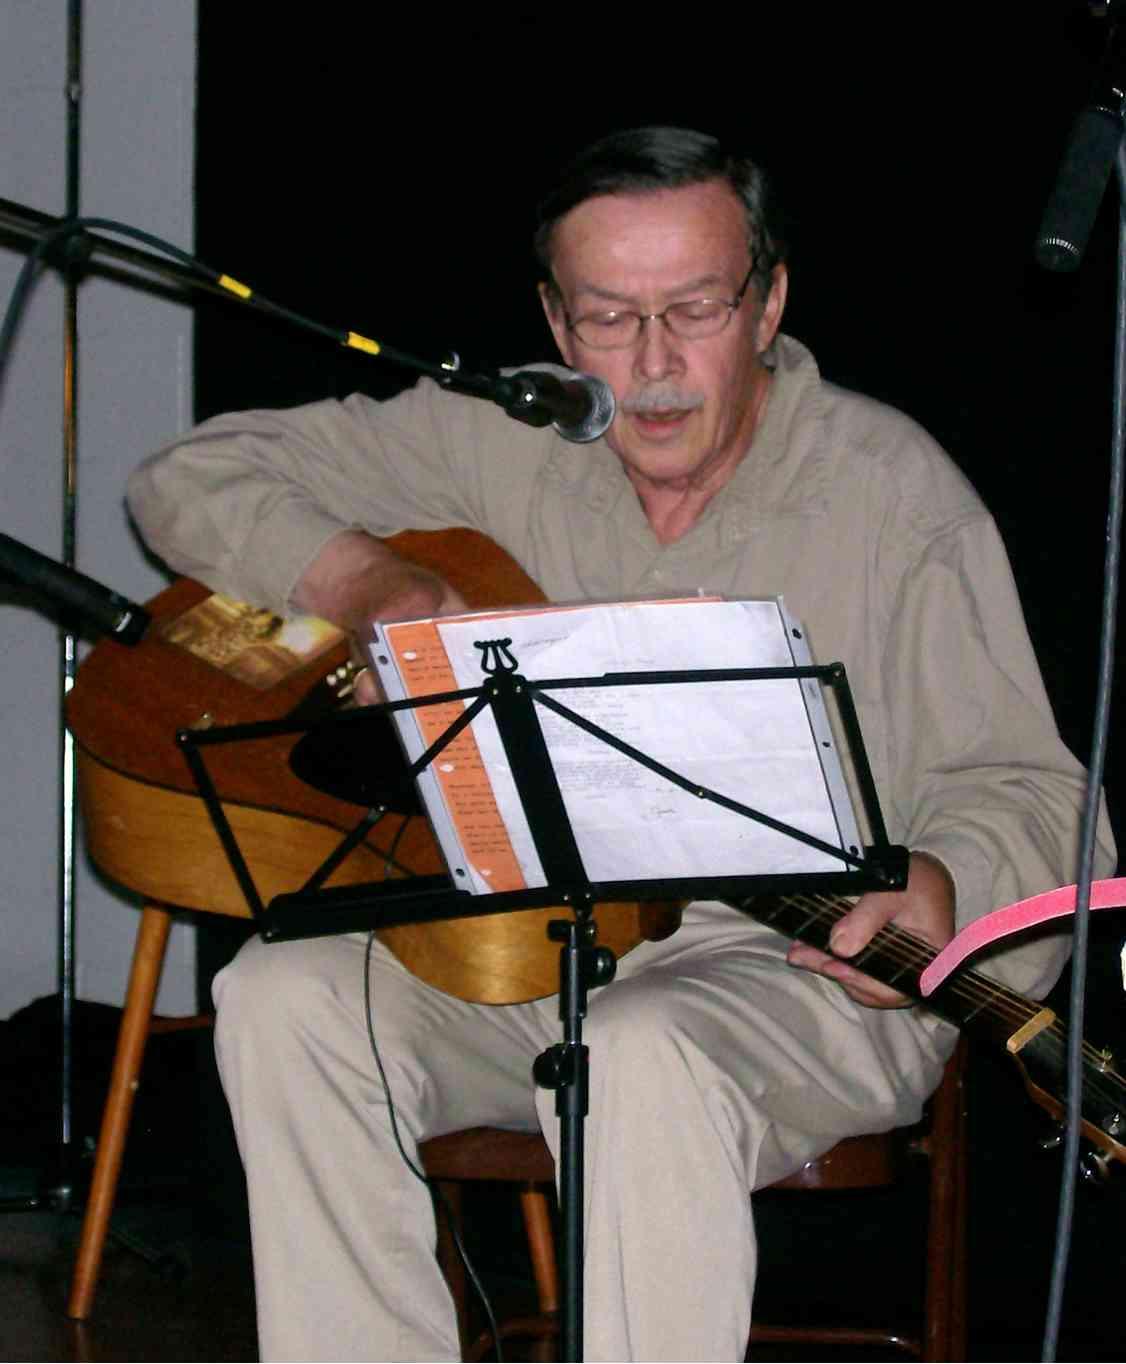 Jack Guest BWFC October 17 2008